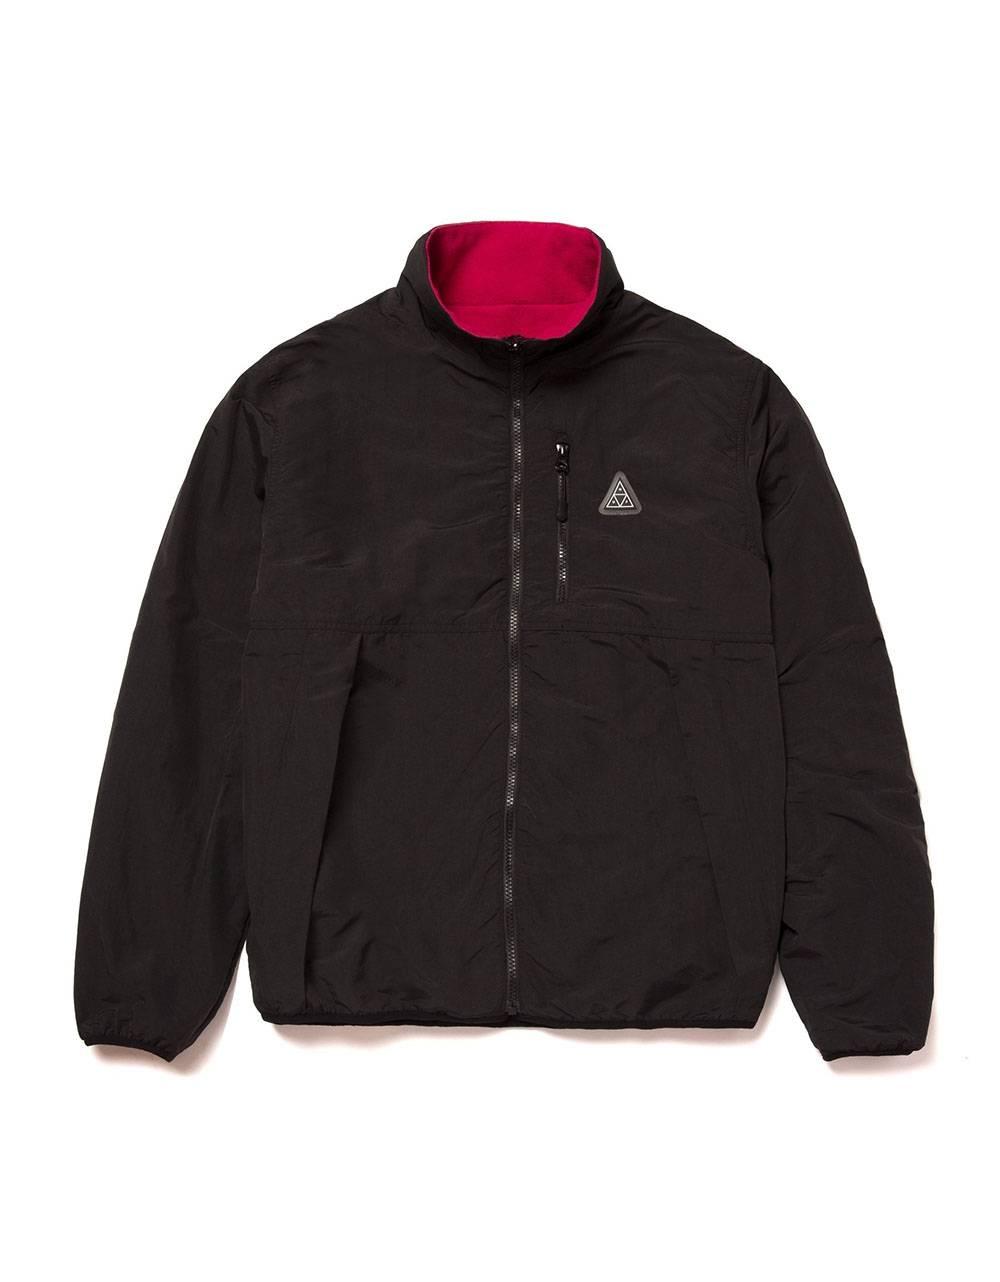 Huf Crisis reversible jacket - black Huf Jacket 219,00€